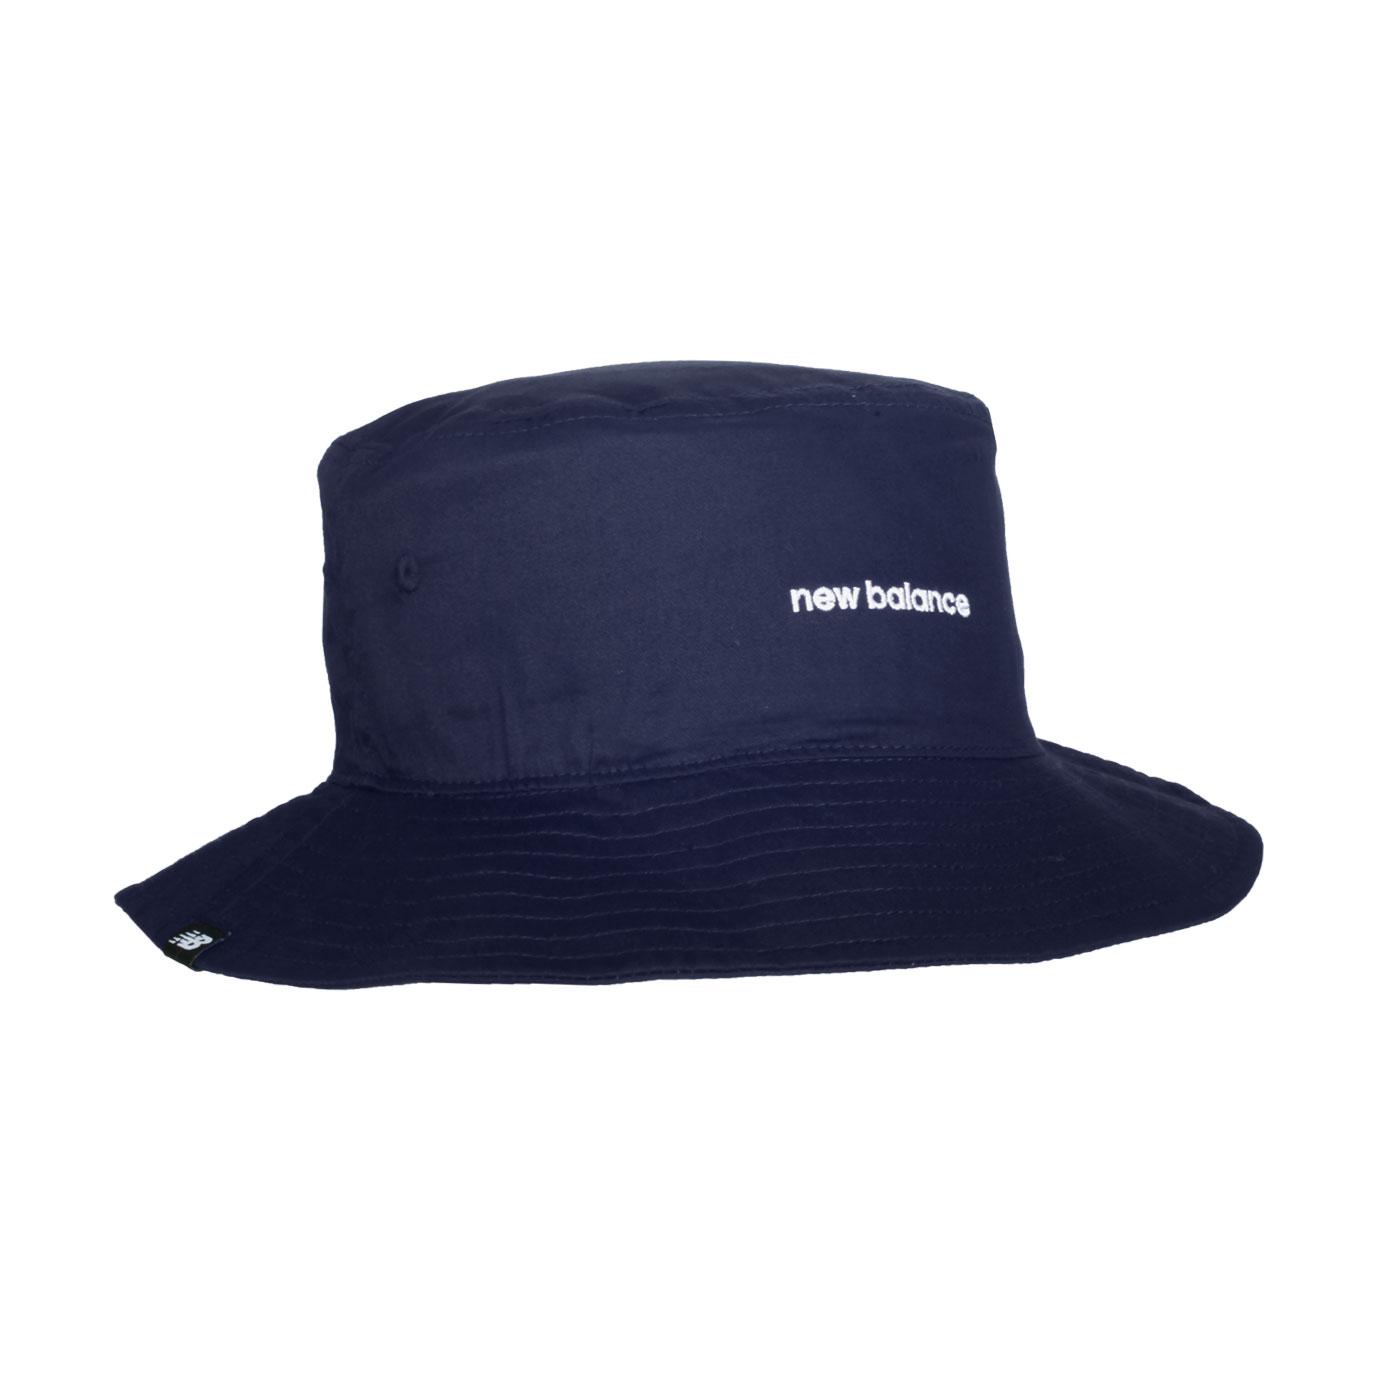 NEW BALANCE 漁夫帽 LAH13003TNV - 丈青白